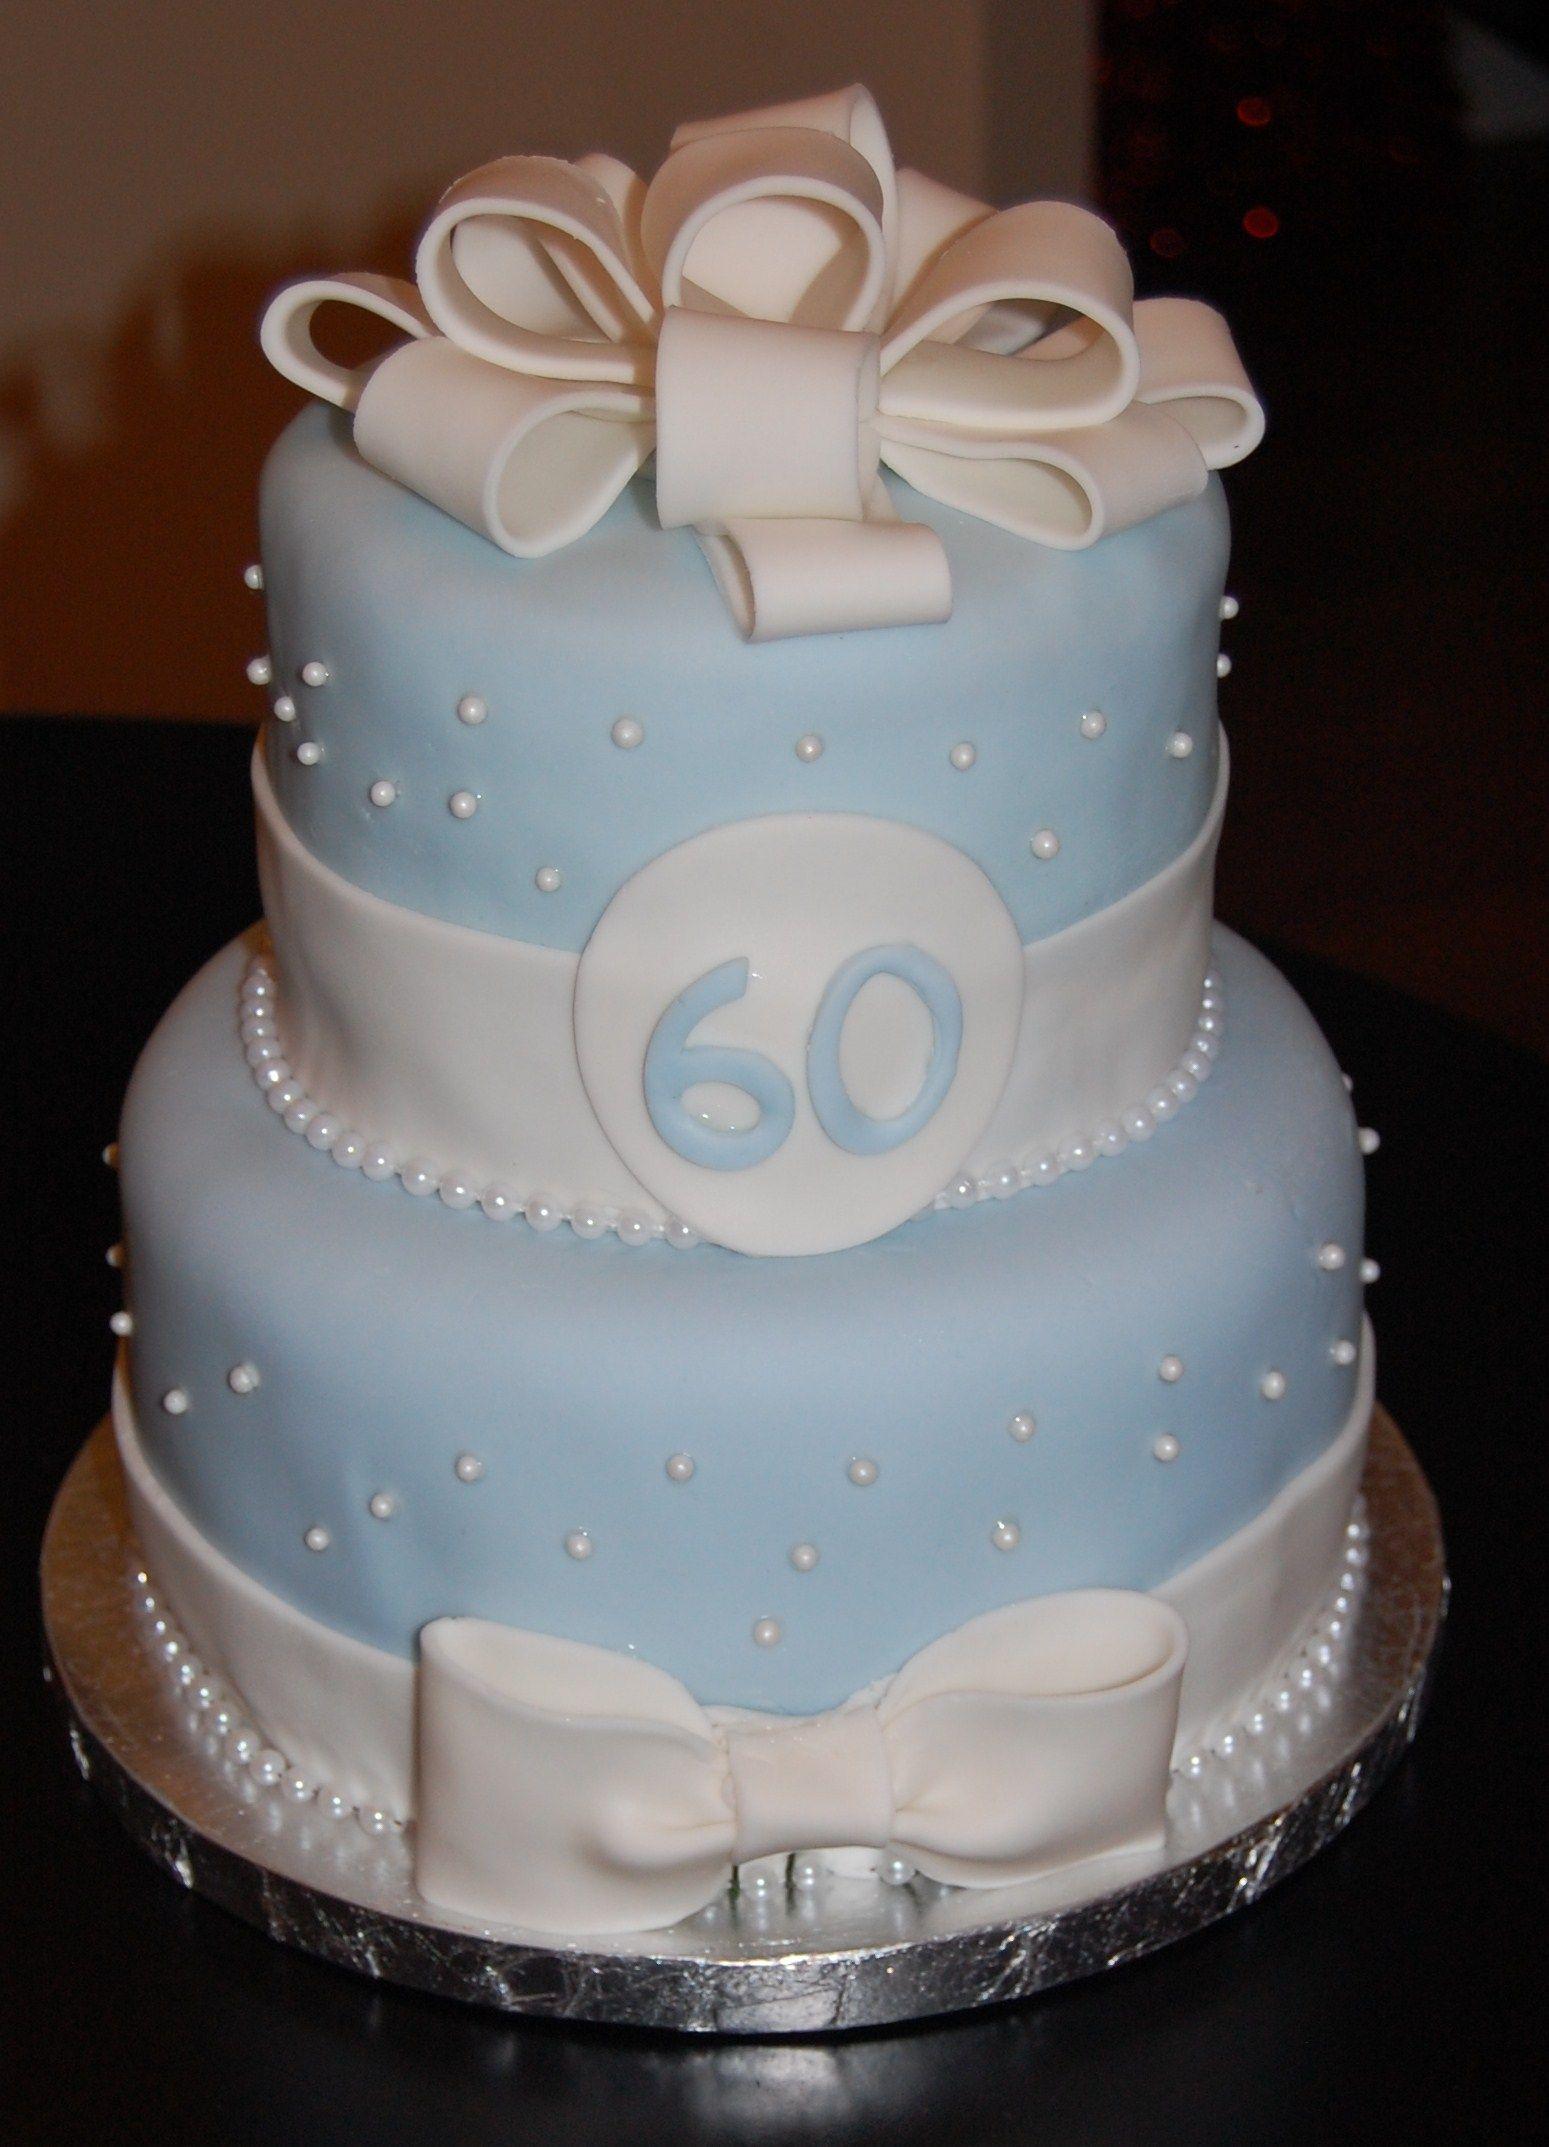 60th Birthday Cake Designs